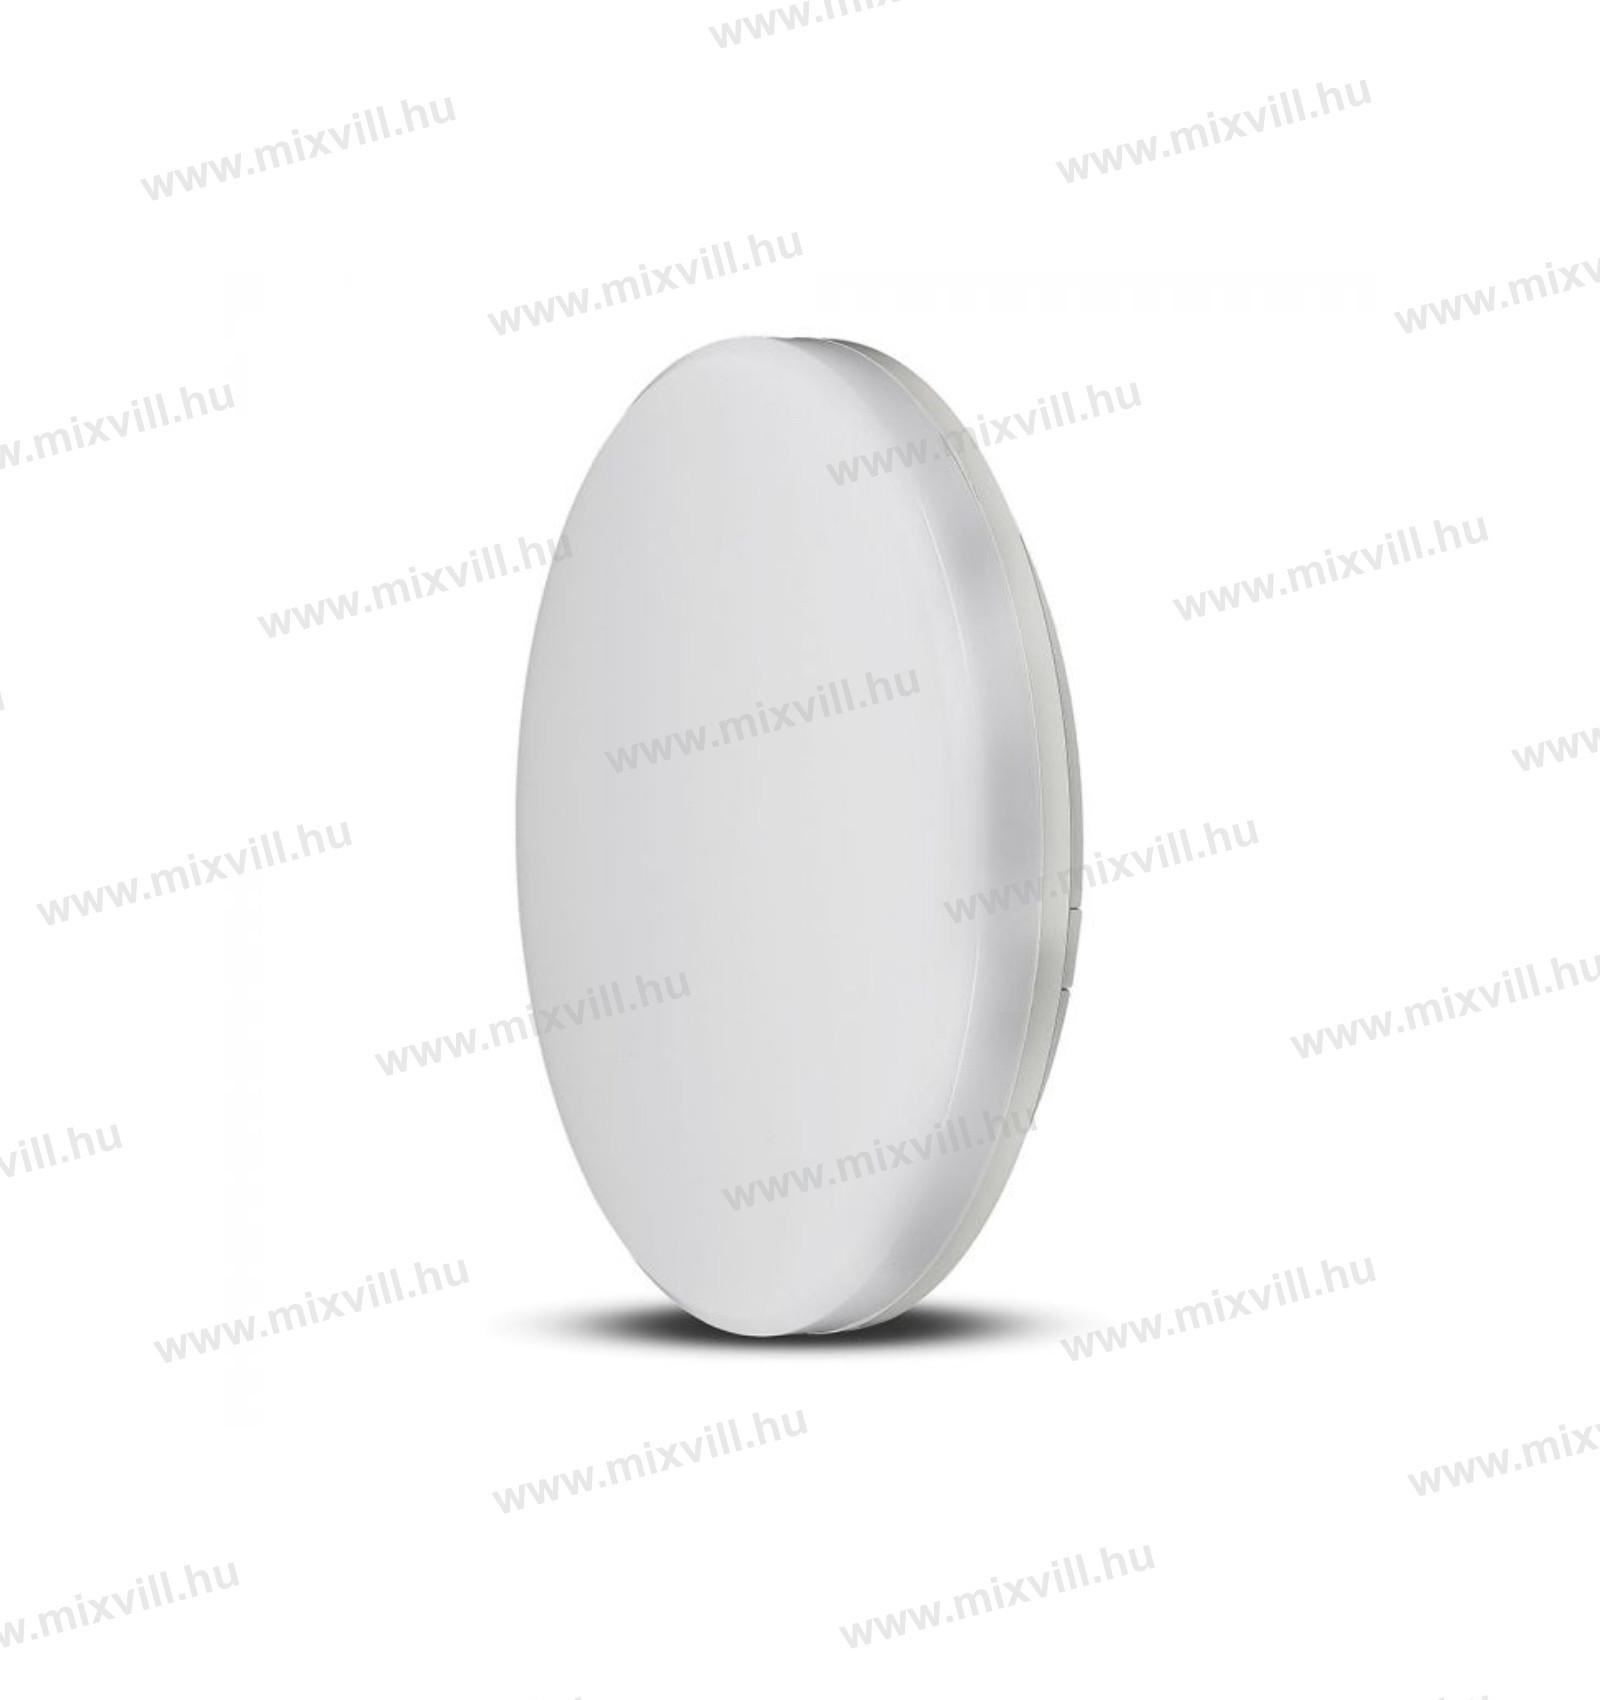 V-tac-sku-13929-kulteri-mennyezeti-kerek-led-lampatest-25w-ip44-6400k-hideg-feher